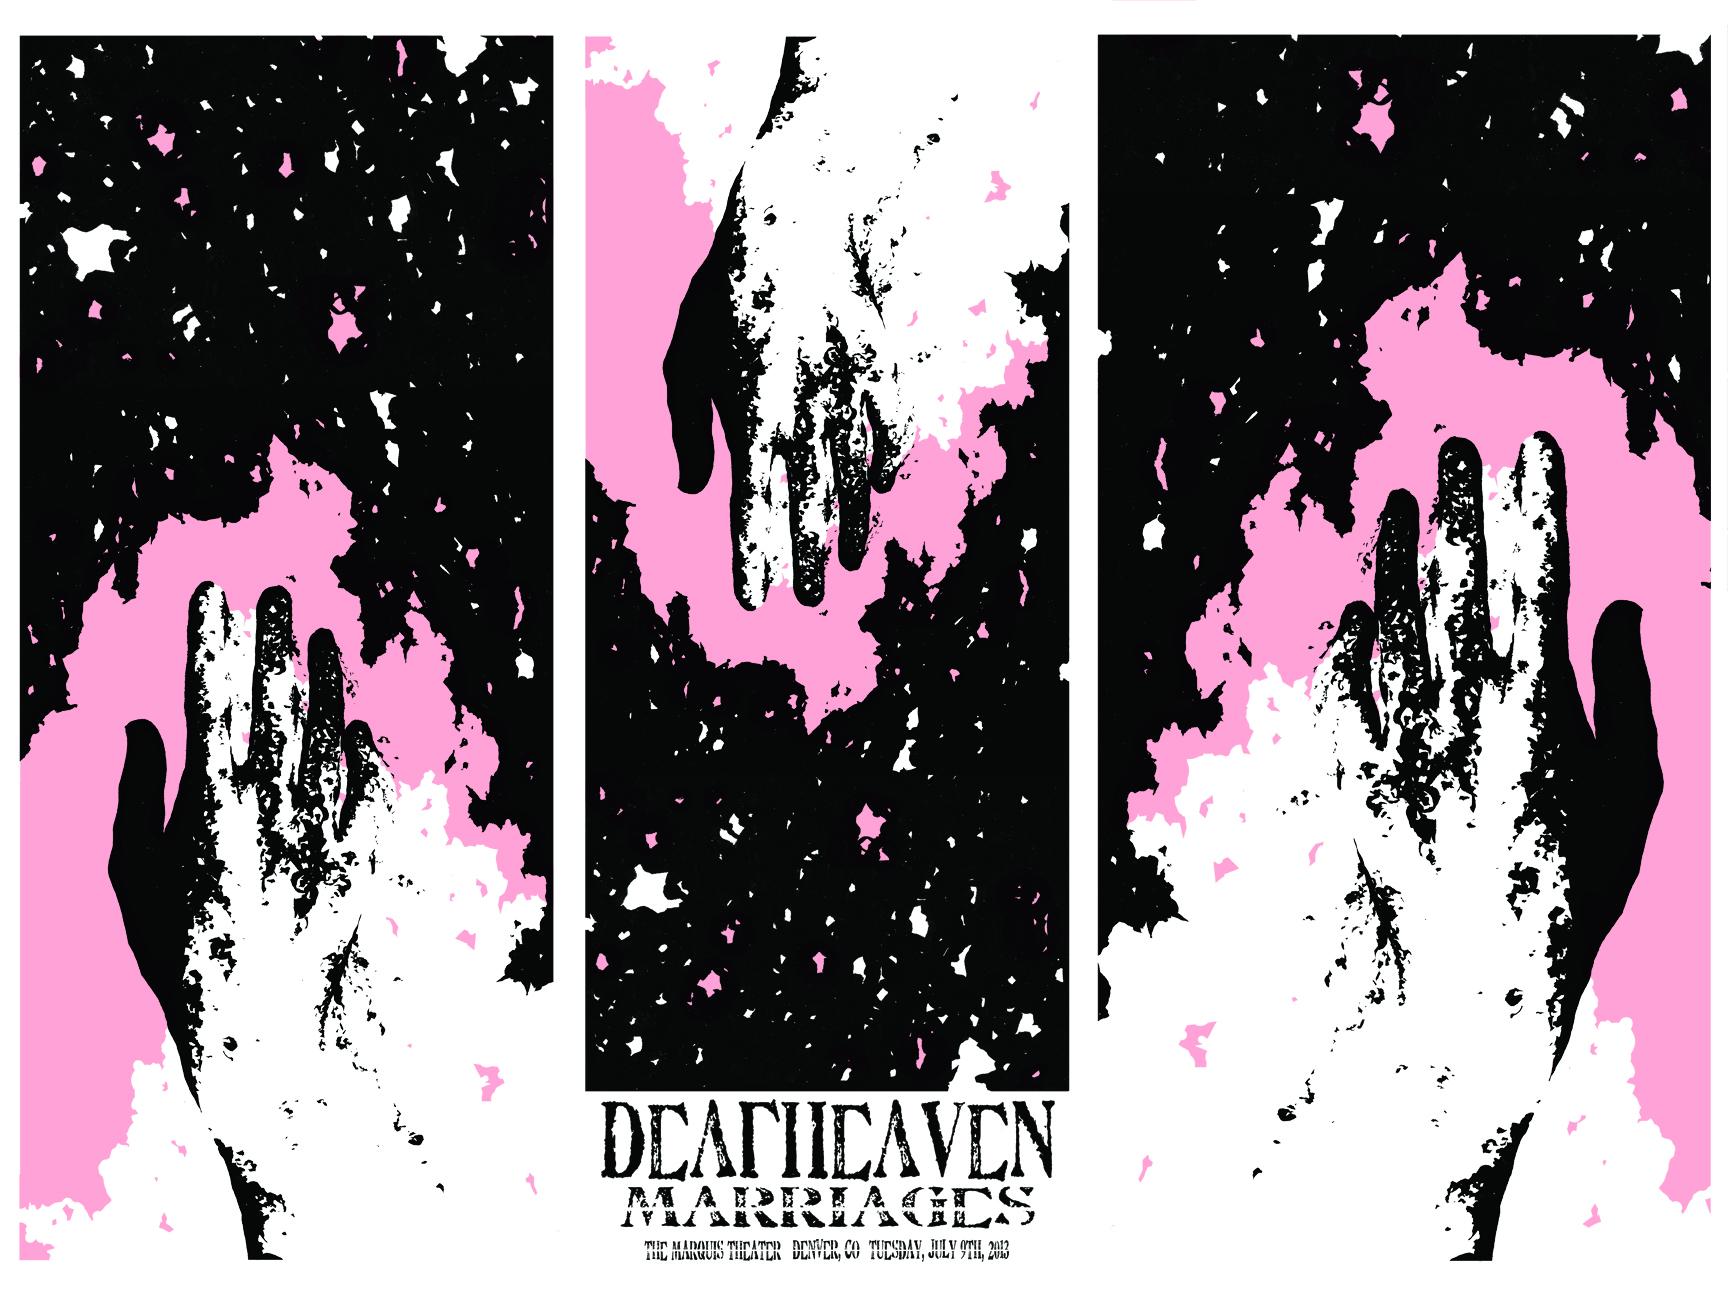 mowry Deafheaven - Denver, CO 2013